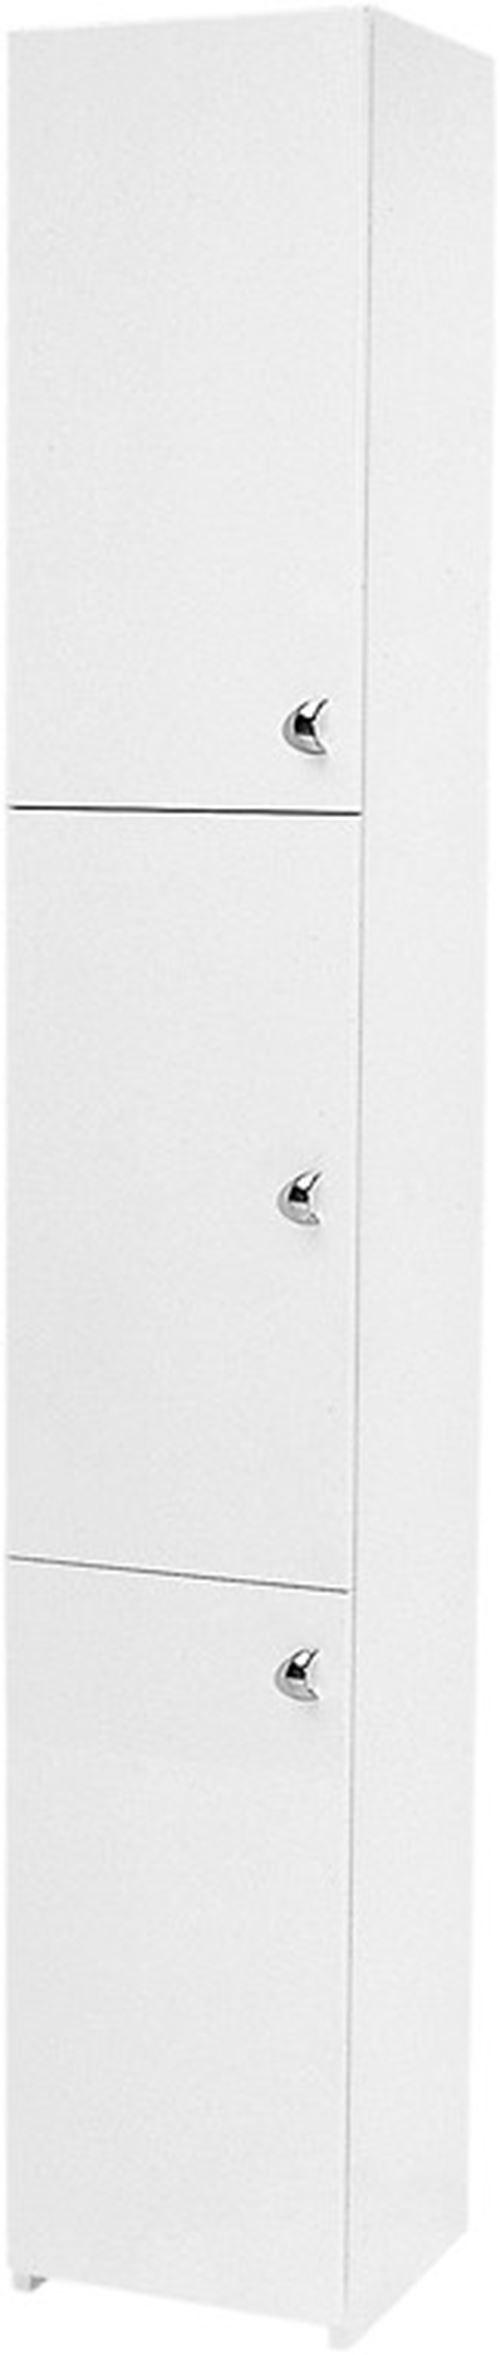 Cersanit Bianco S509-014-DSM